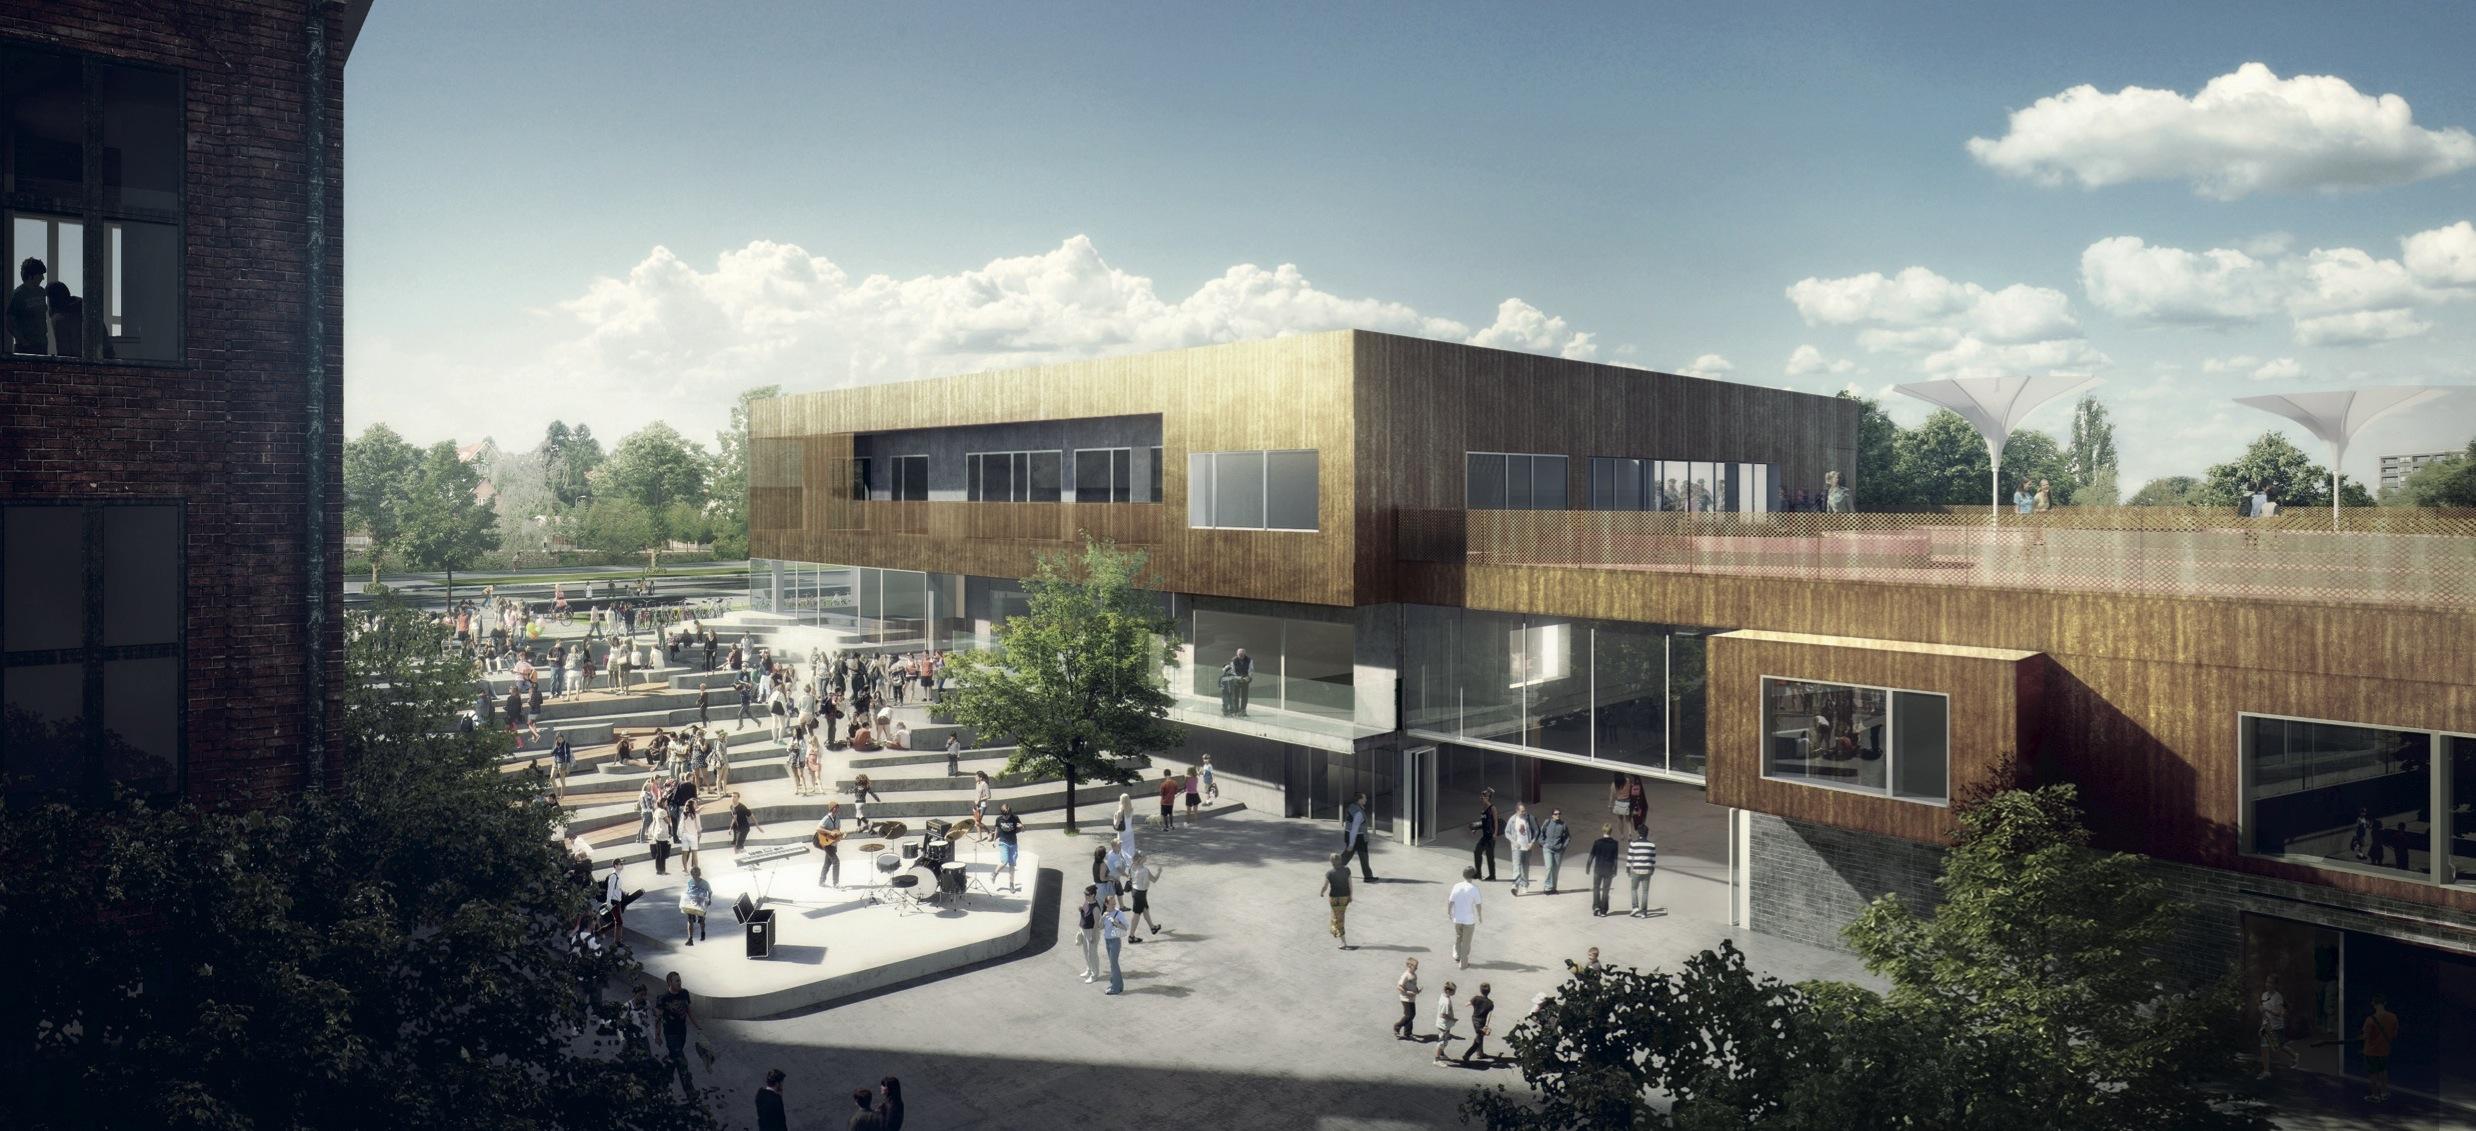 Helsingor New Mid-town School